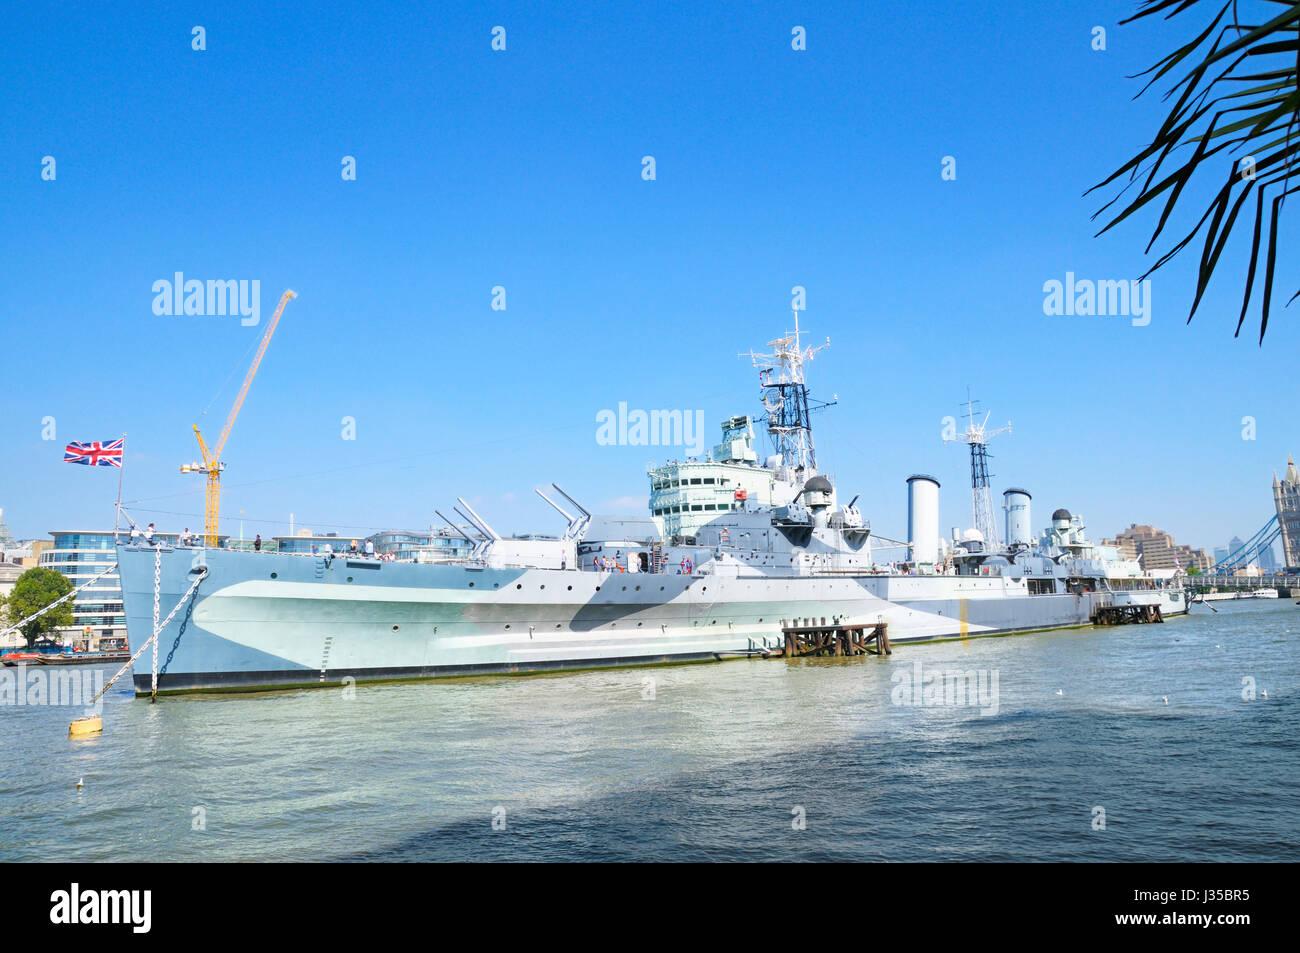 HMS Belfast vor Anker auf der Themse, London, England, UK Stockbild